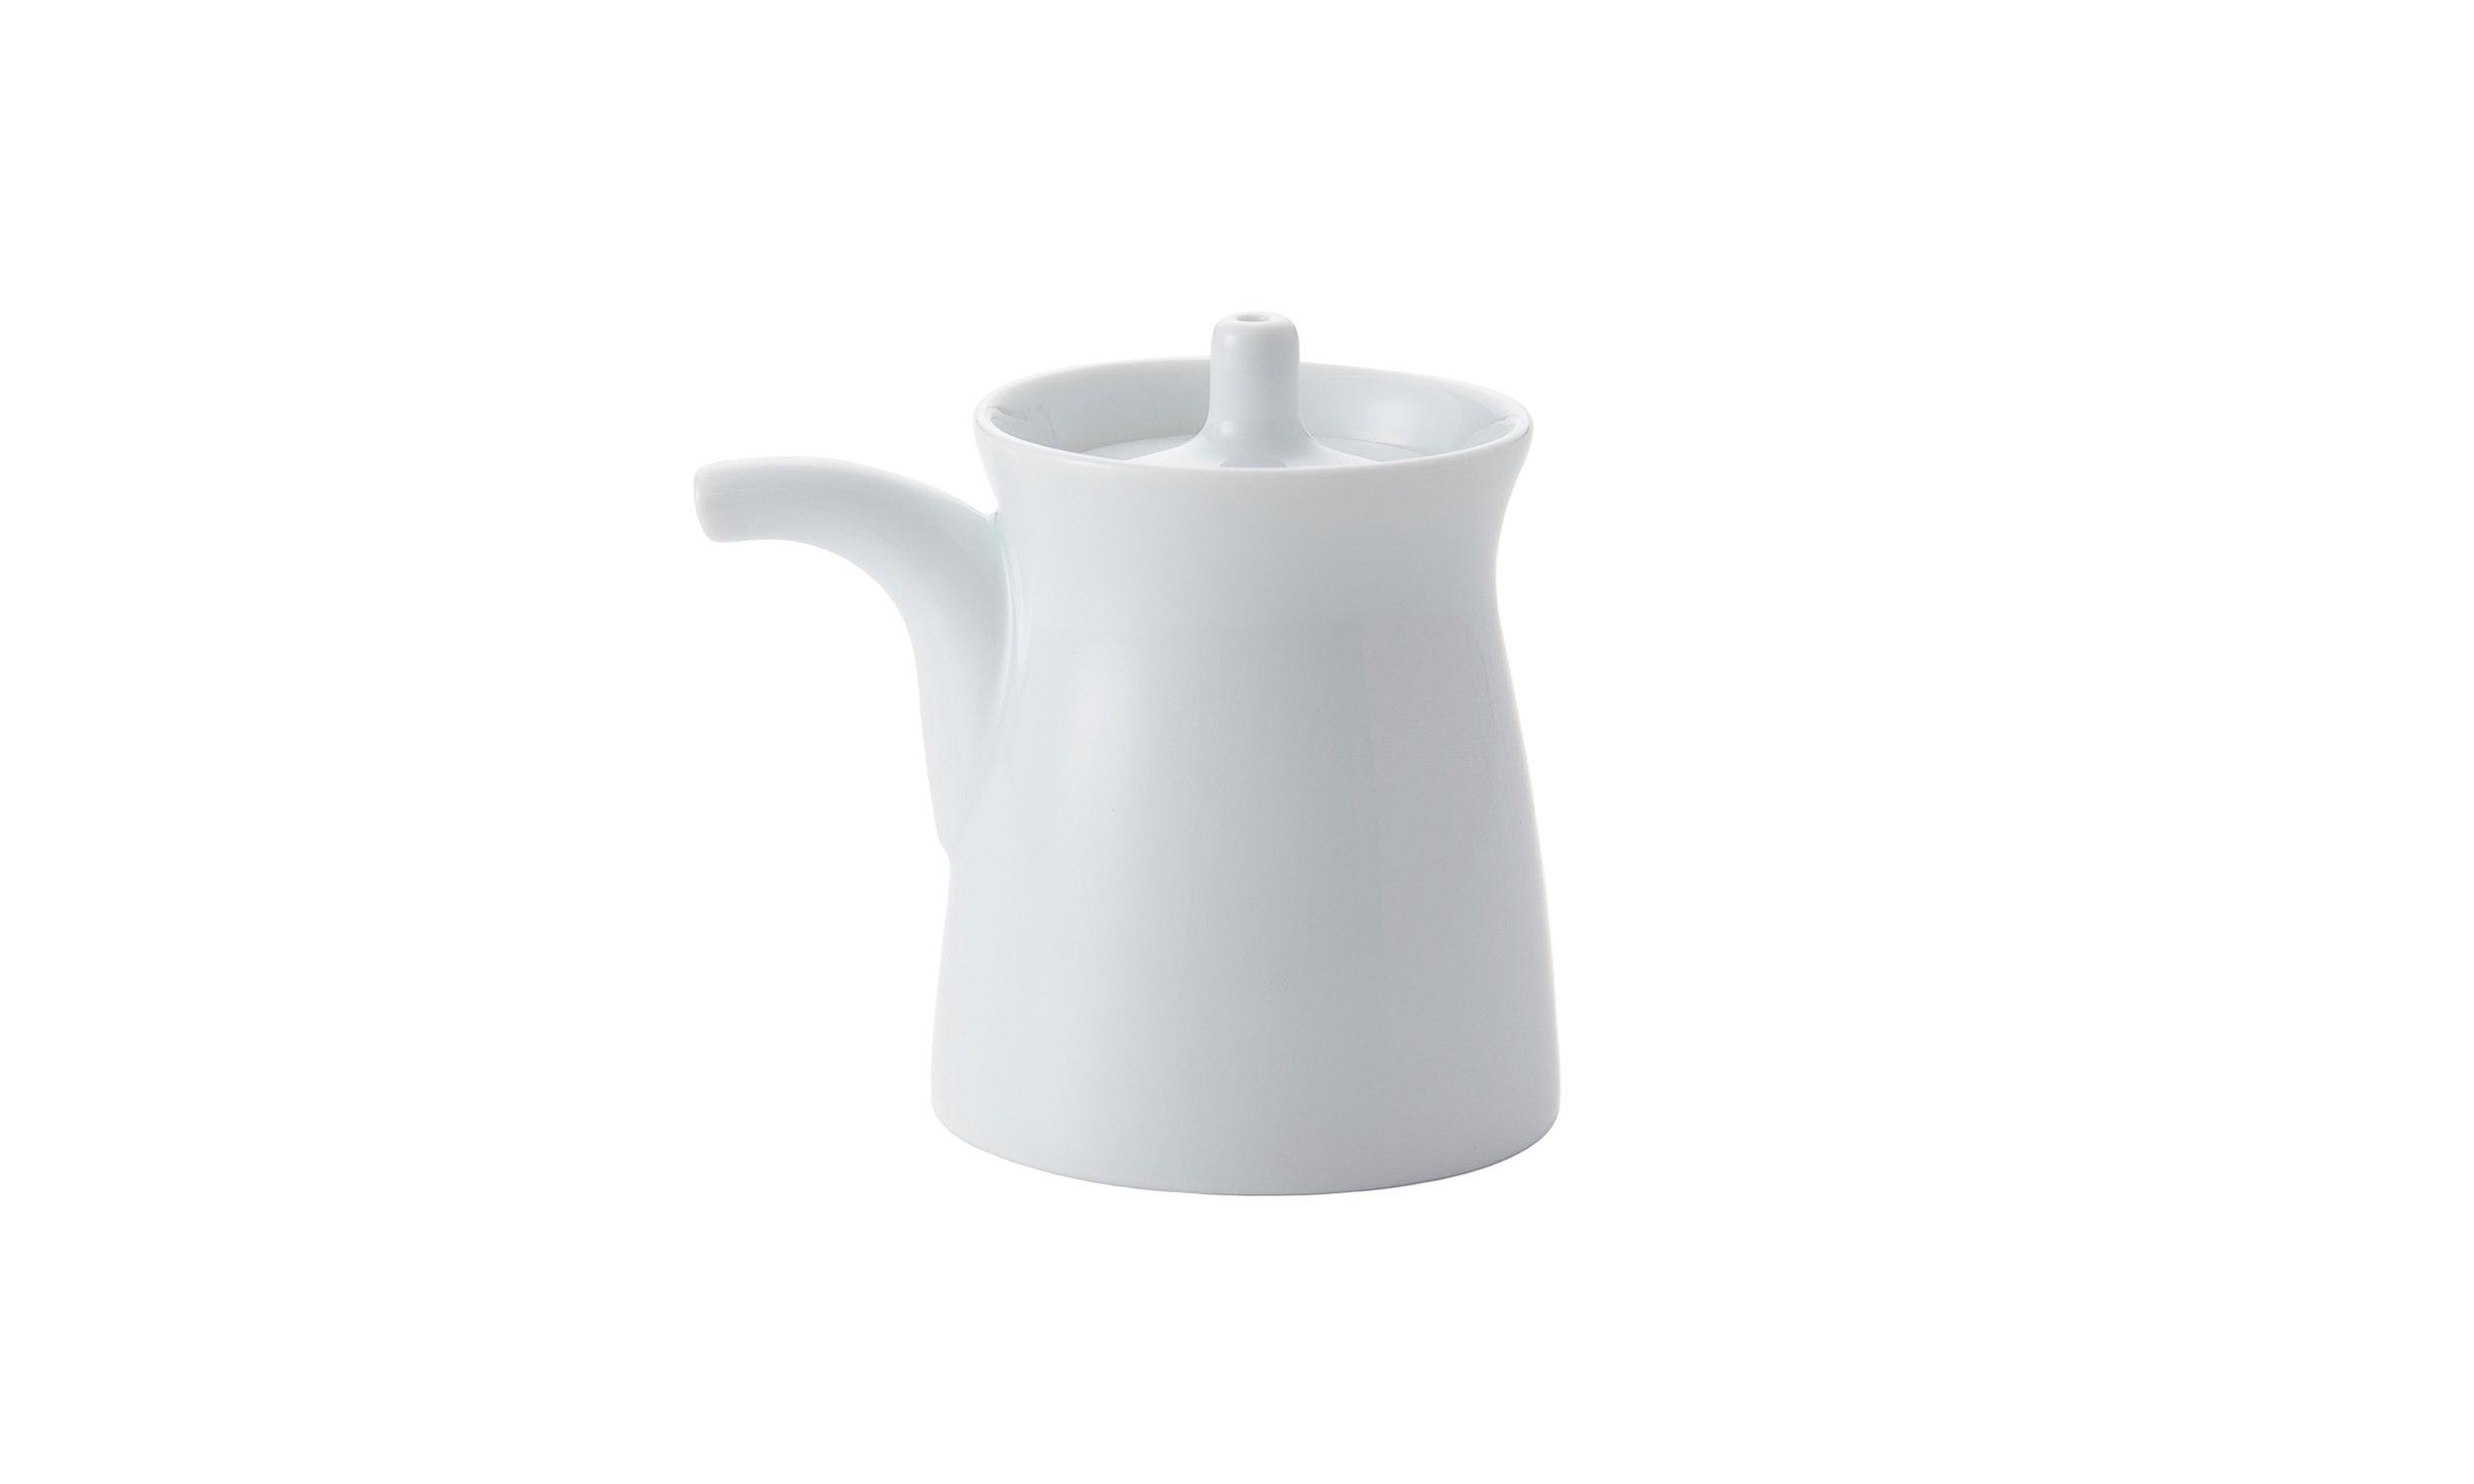 bureau-des-recommandations-soy-sauce-dispenser-hakusan-porcelain-masahiro-mori-g-type-bottle-white.jpg